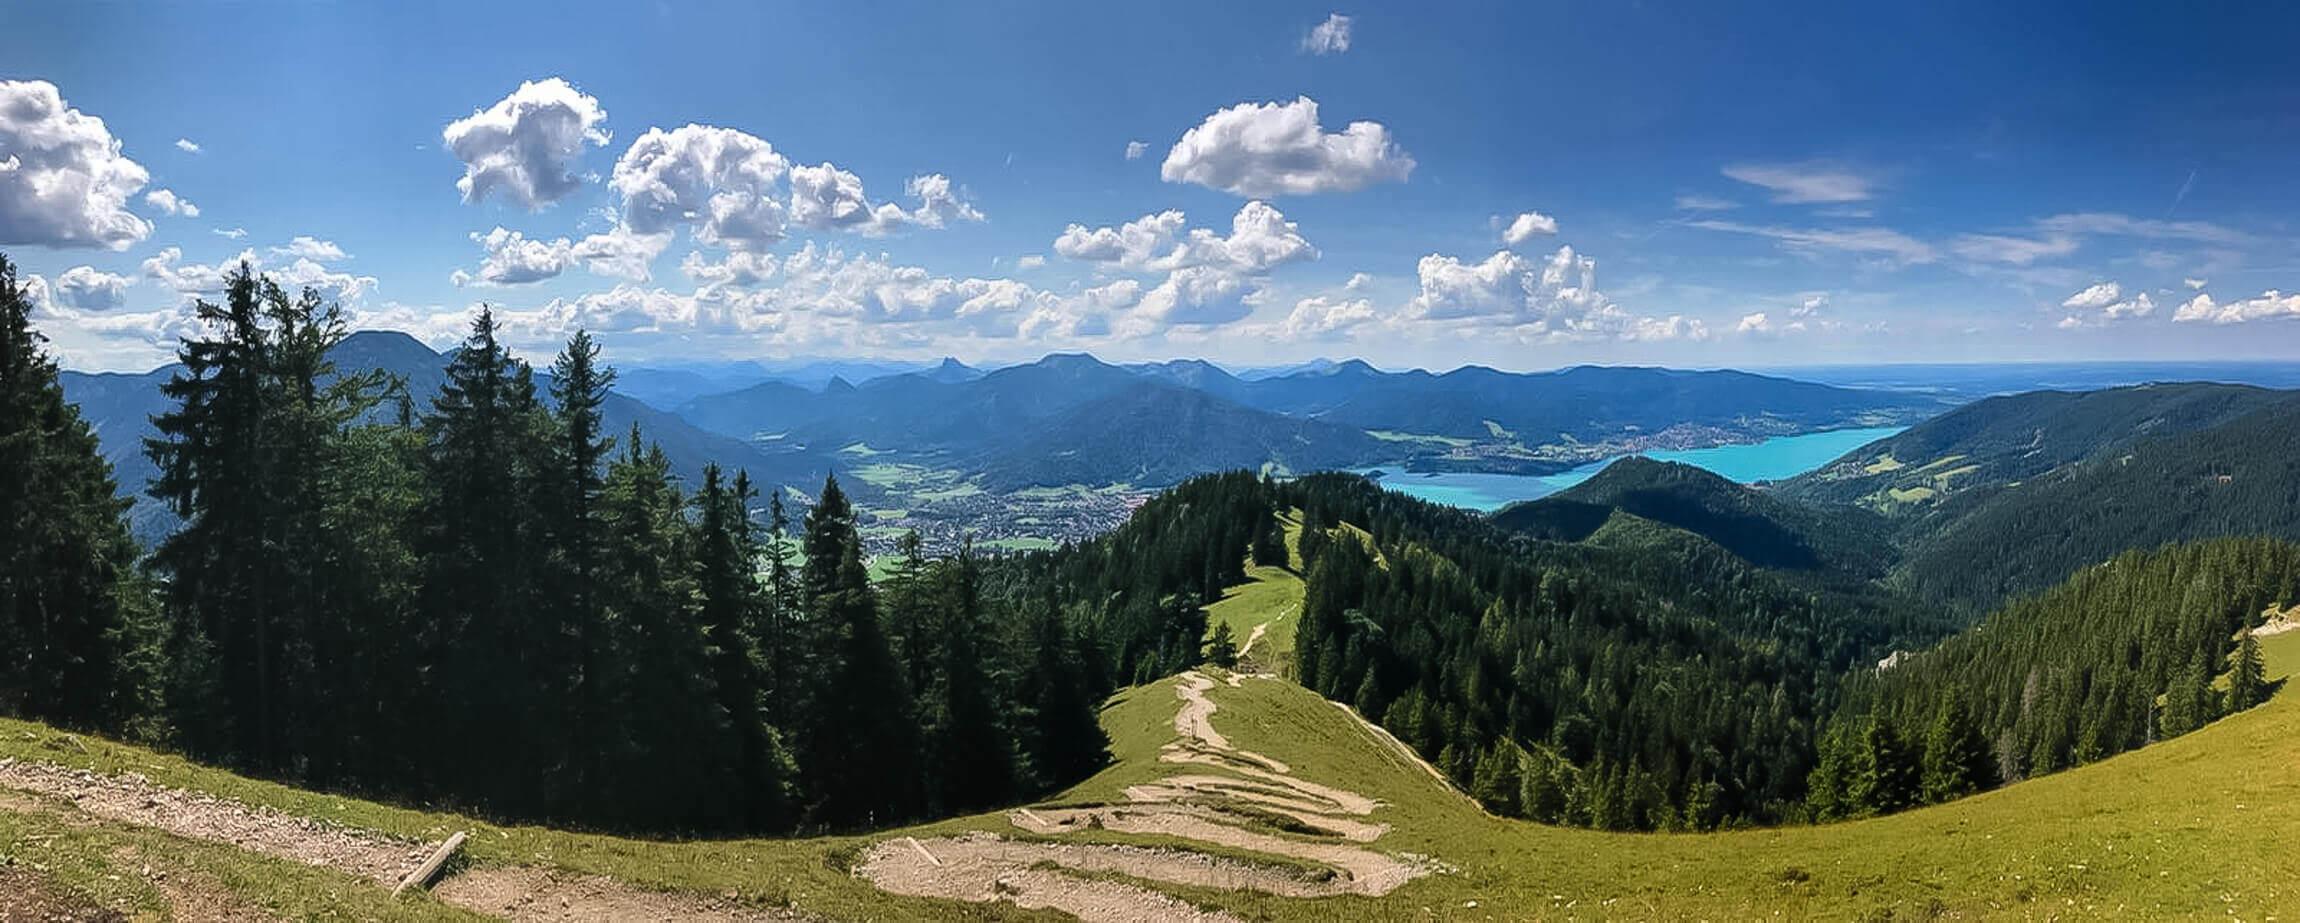 Baumgartenschneid Panorama